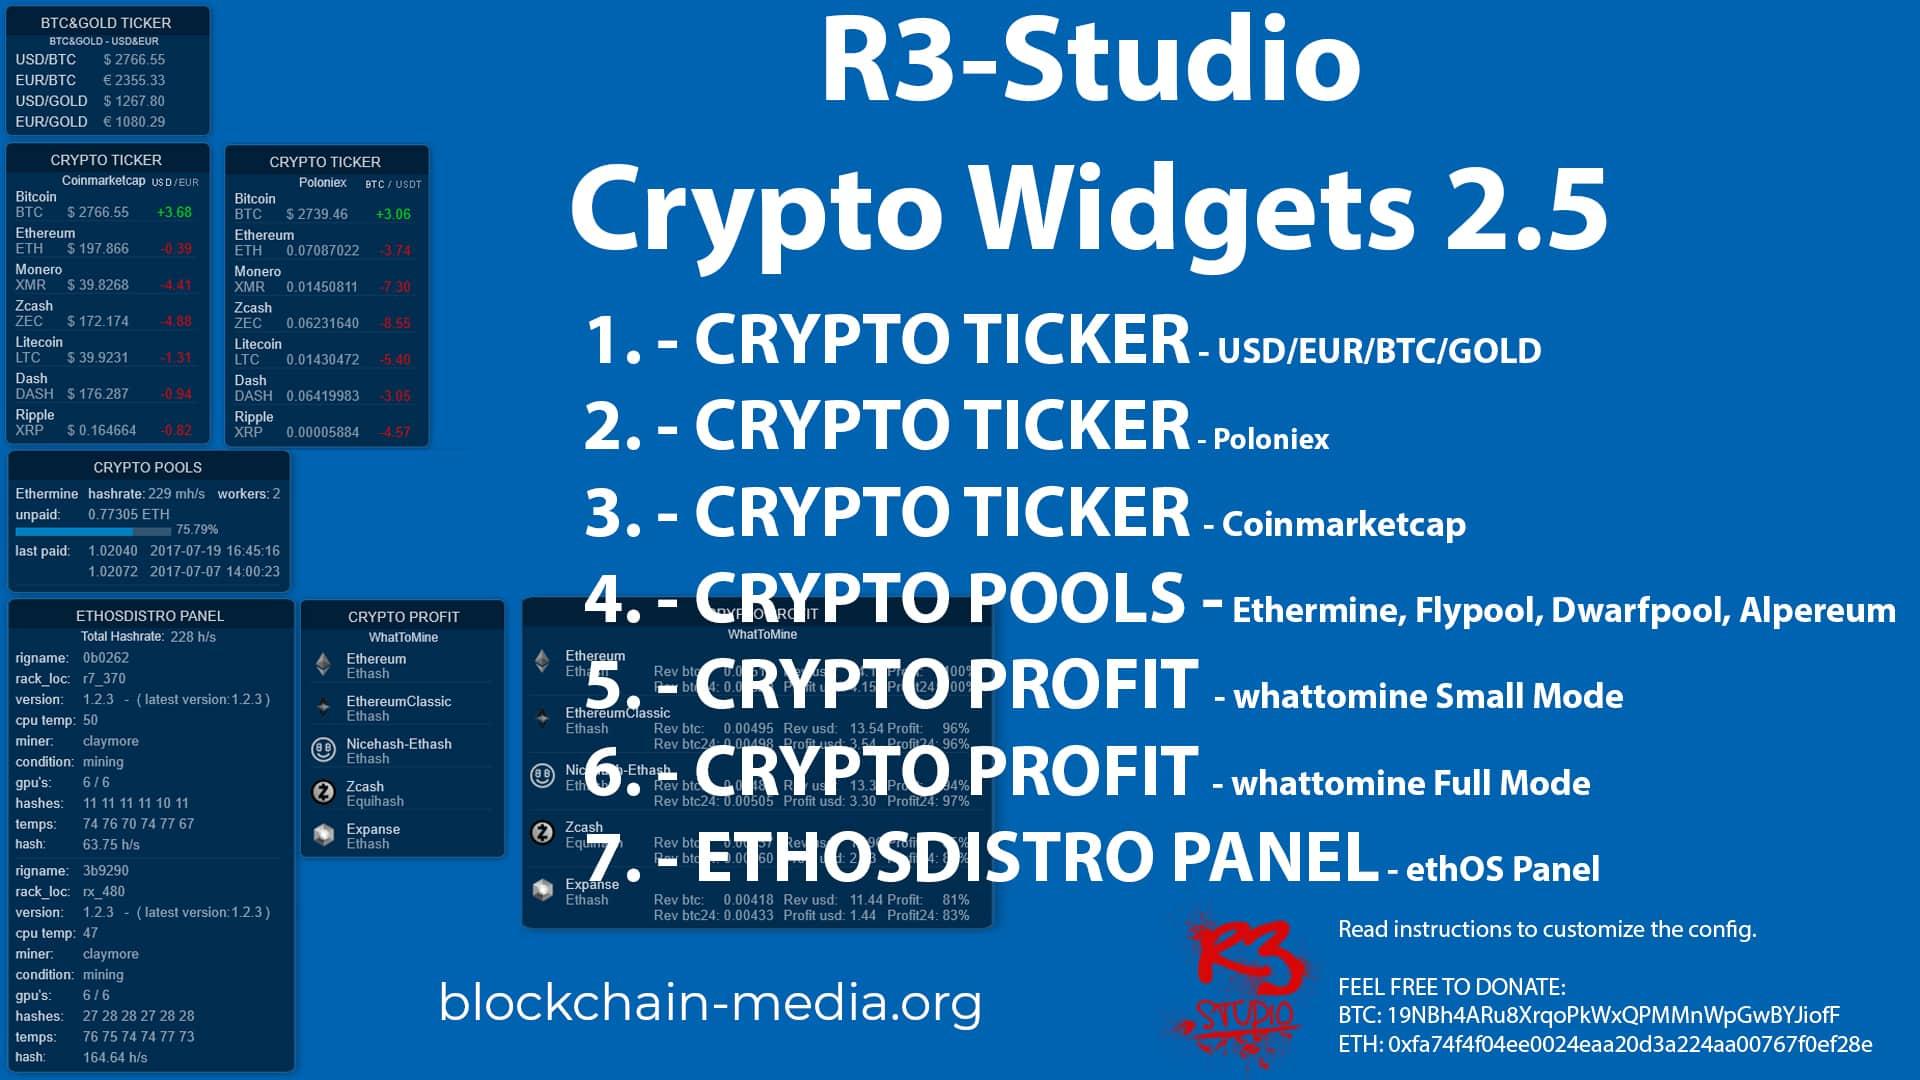 rainmeter-cryptocurrency виджет криптовалют